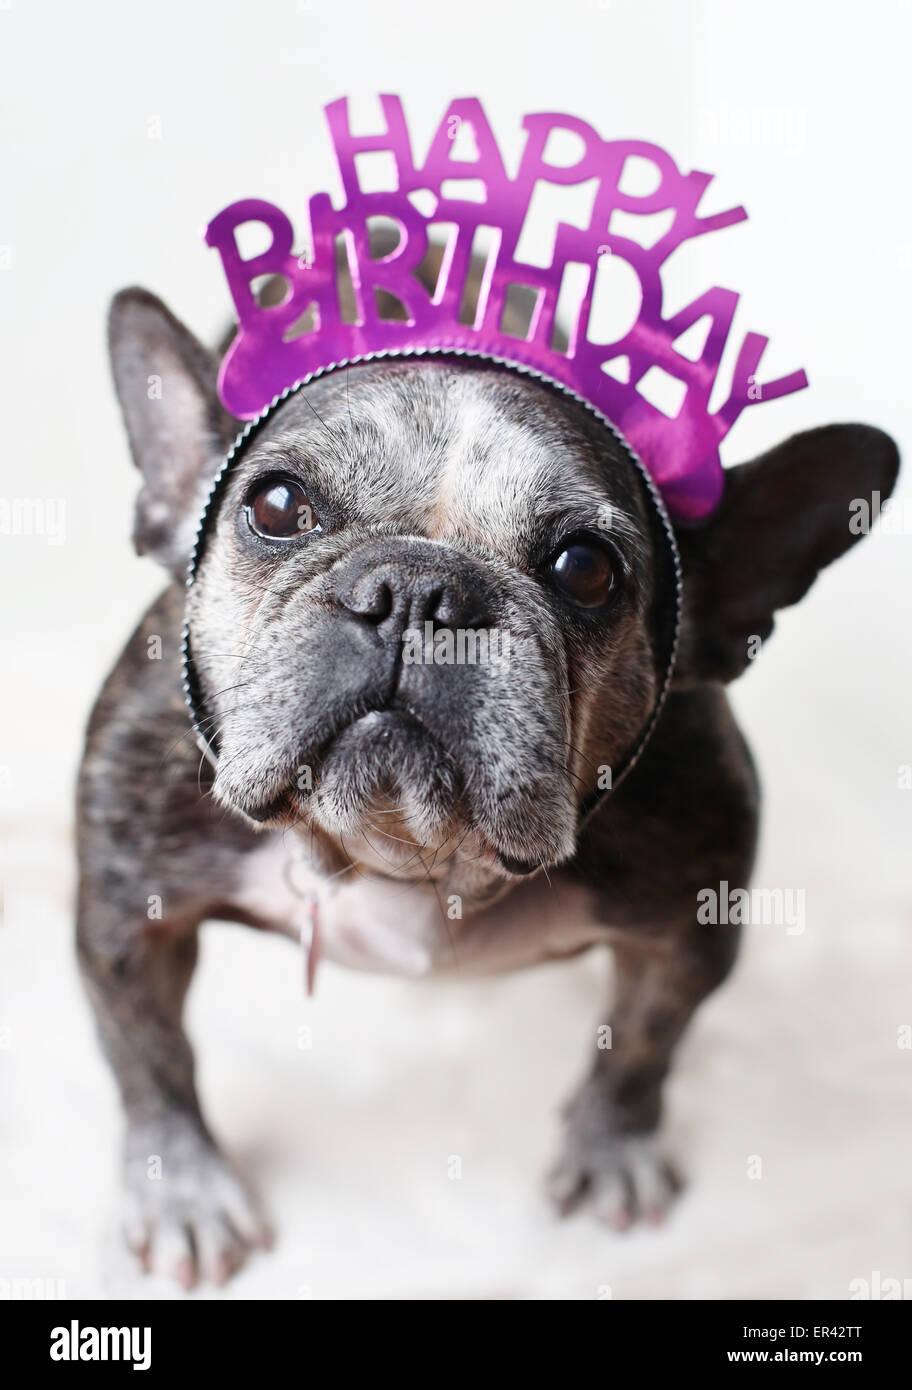 Happy Bulldog birthday pictures rare photo